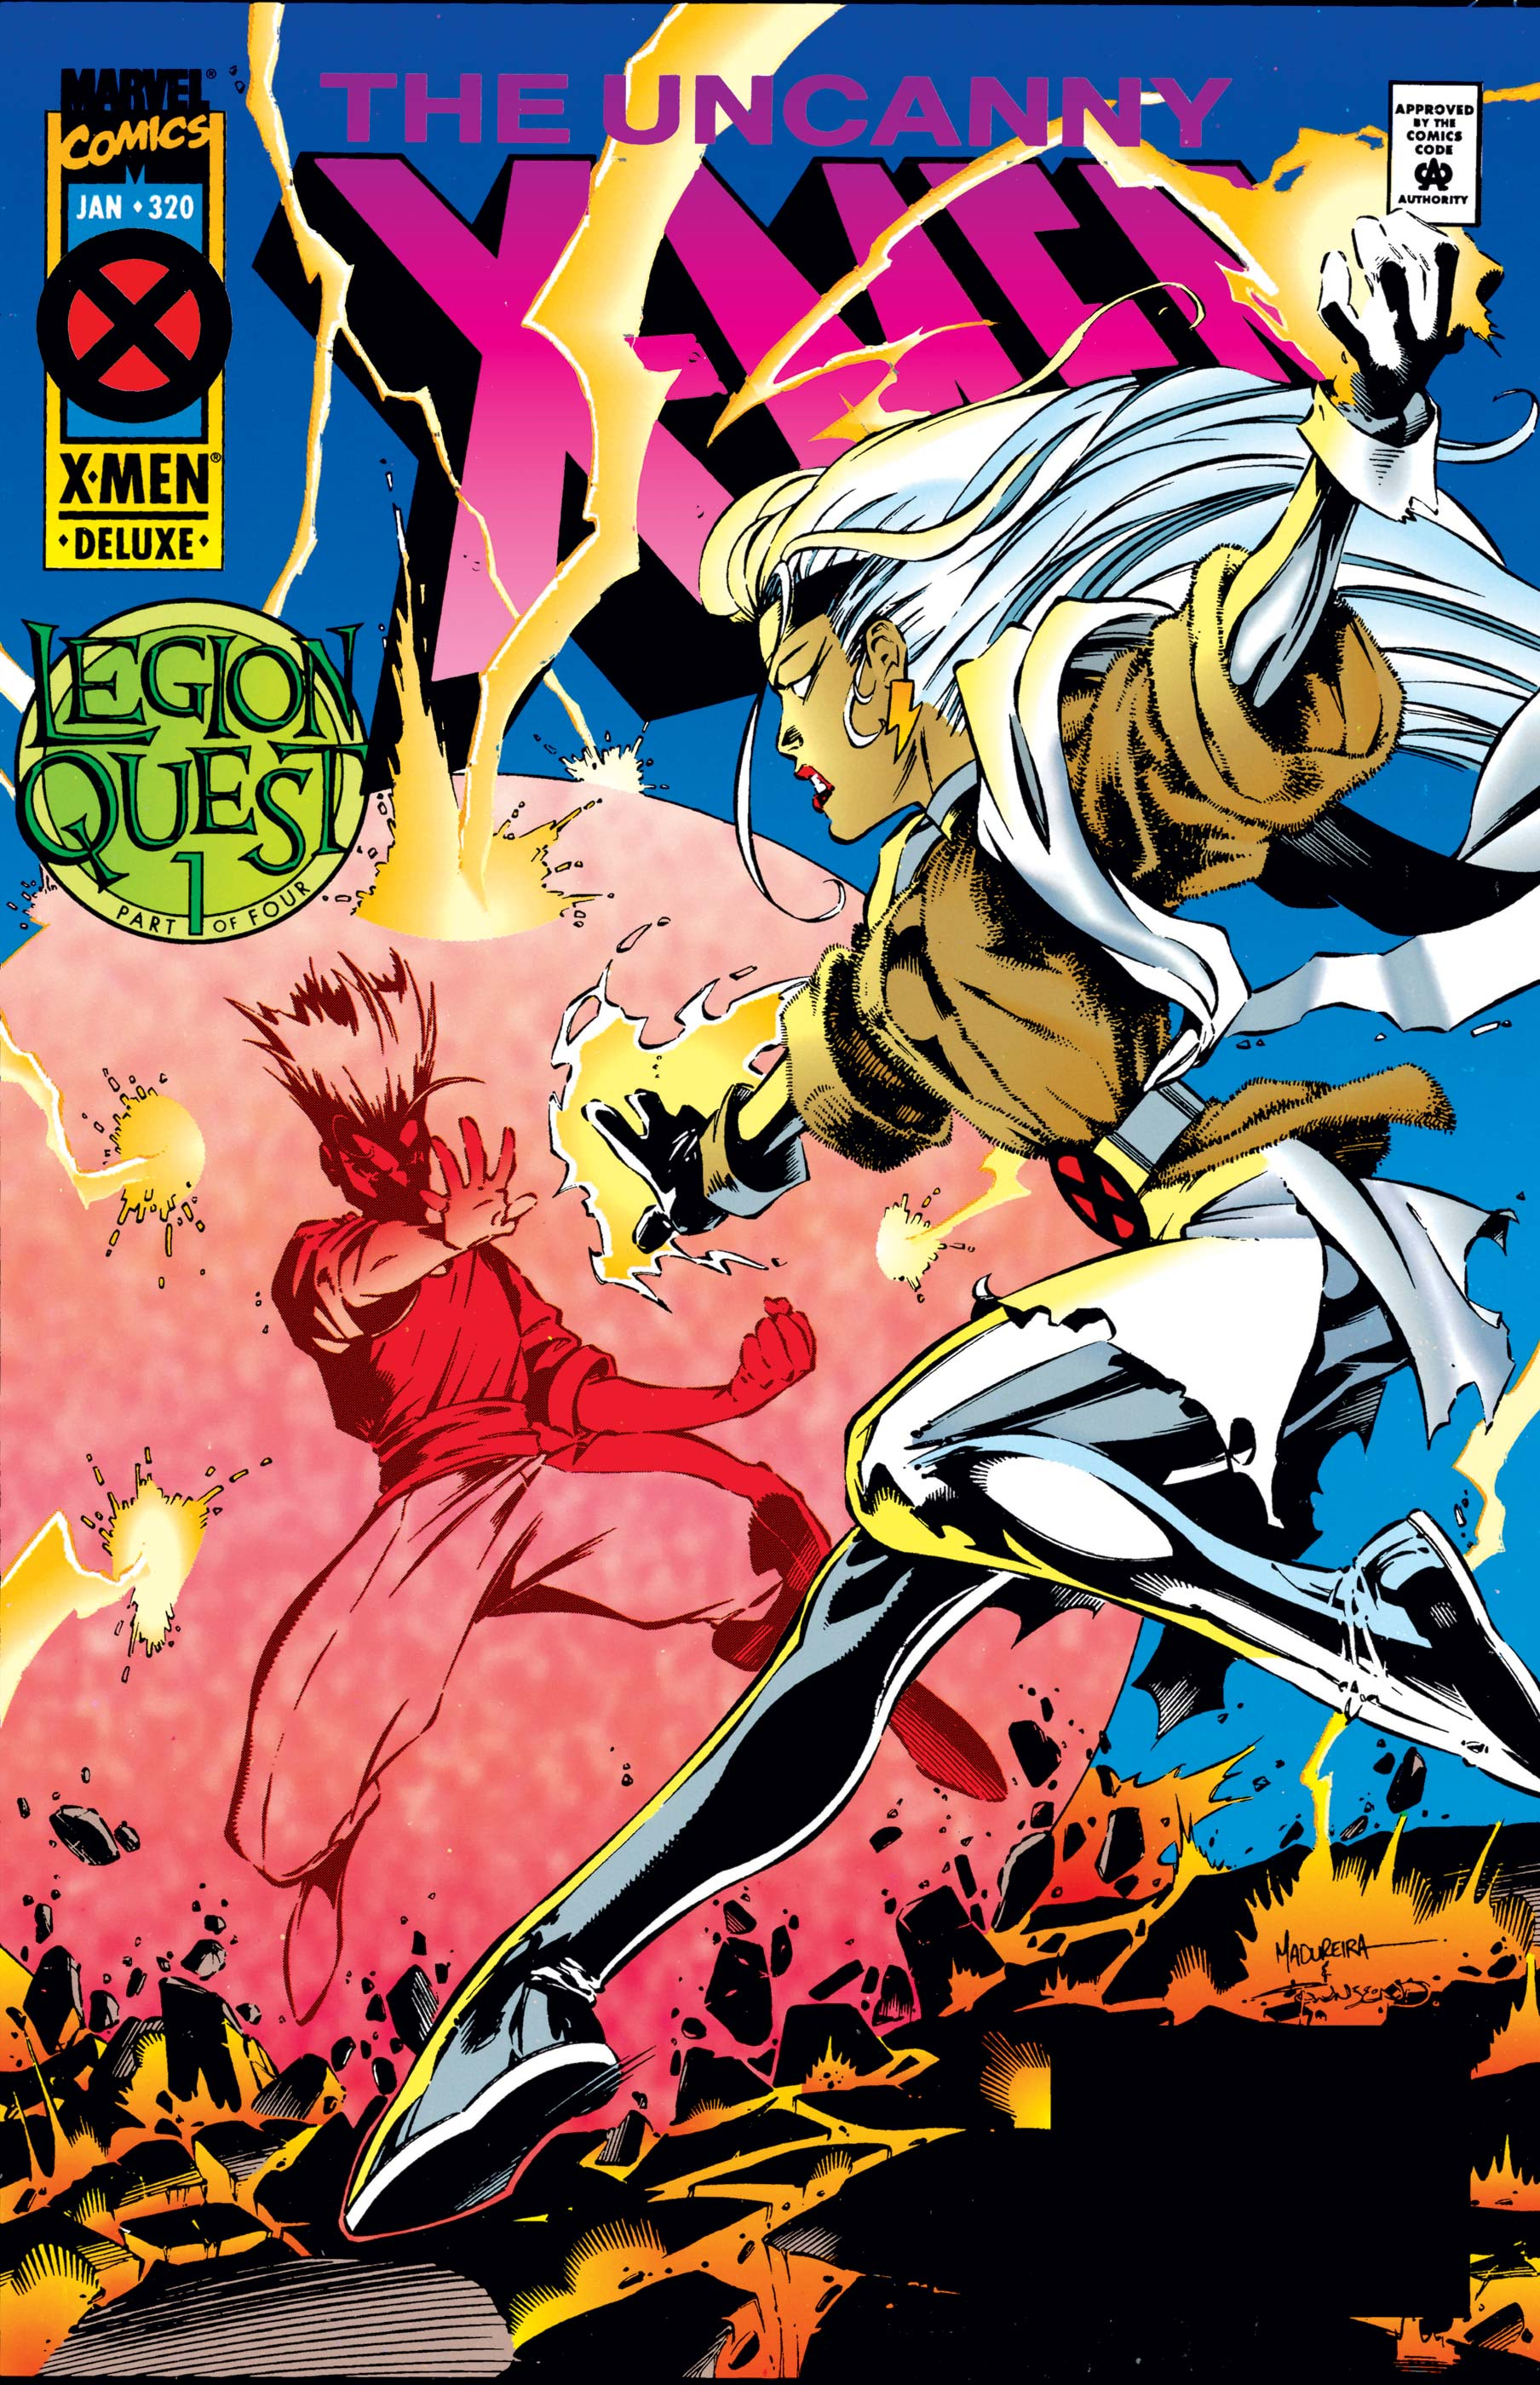 Uncanny X-Men (1963) #320